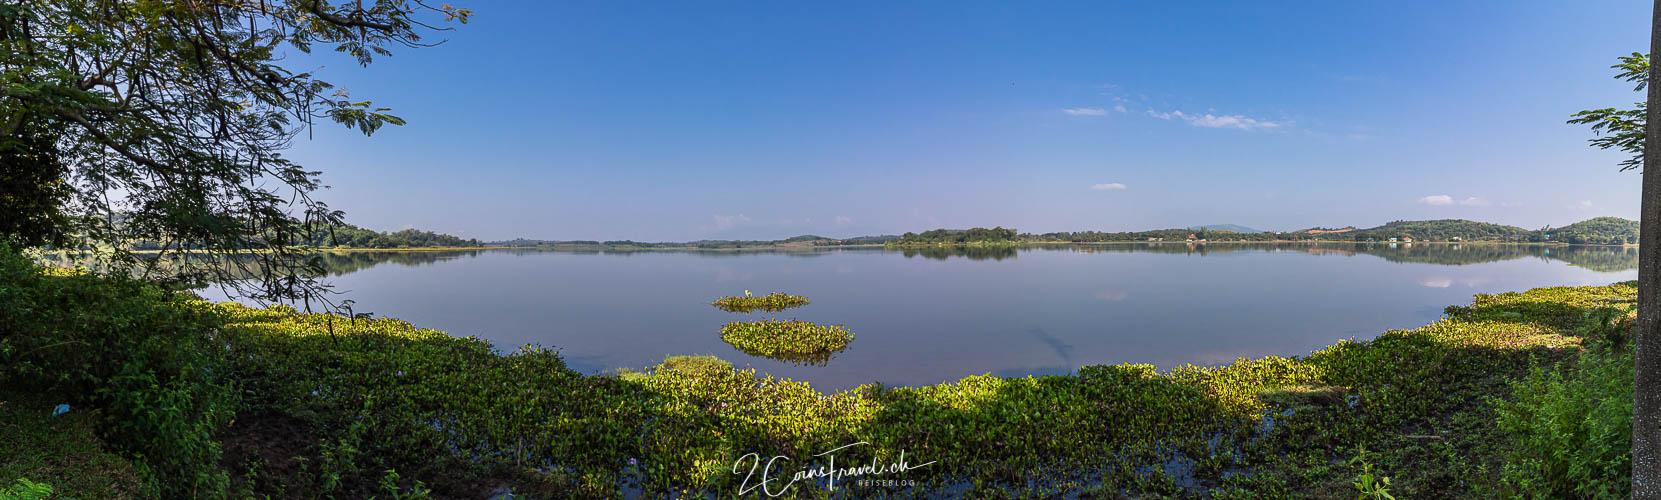 Panorama Chiang Saen Lake